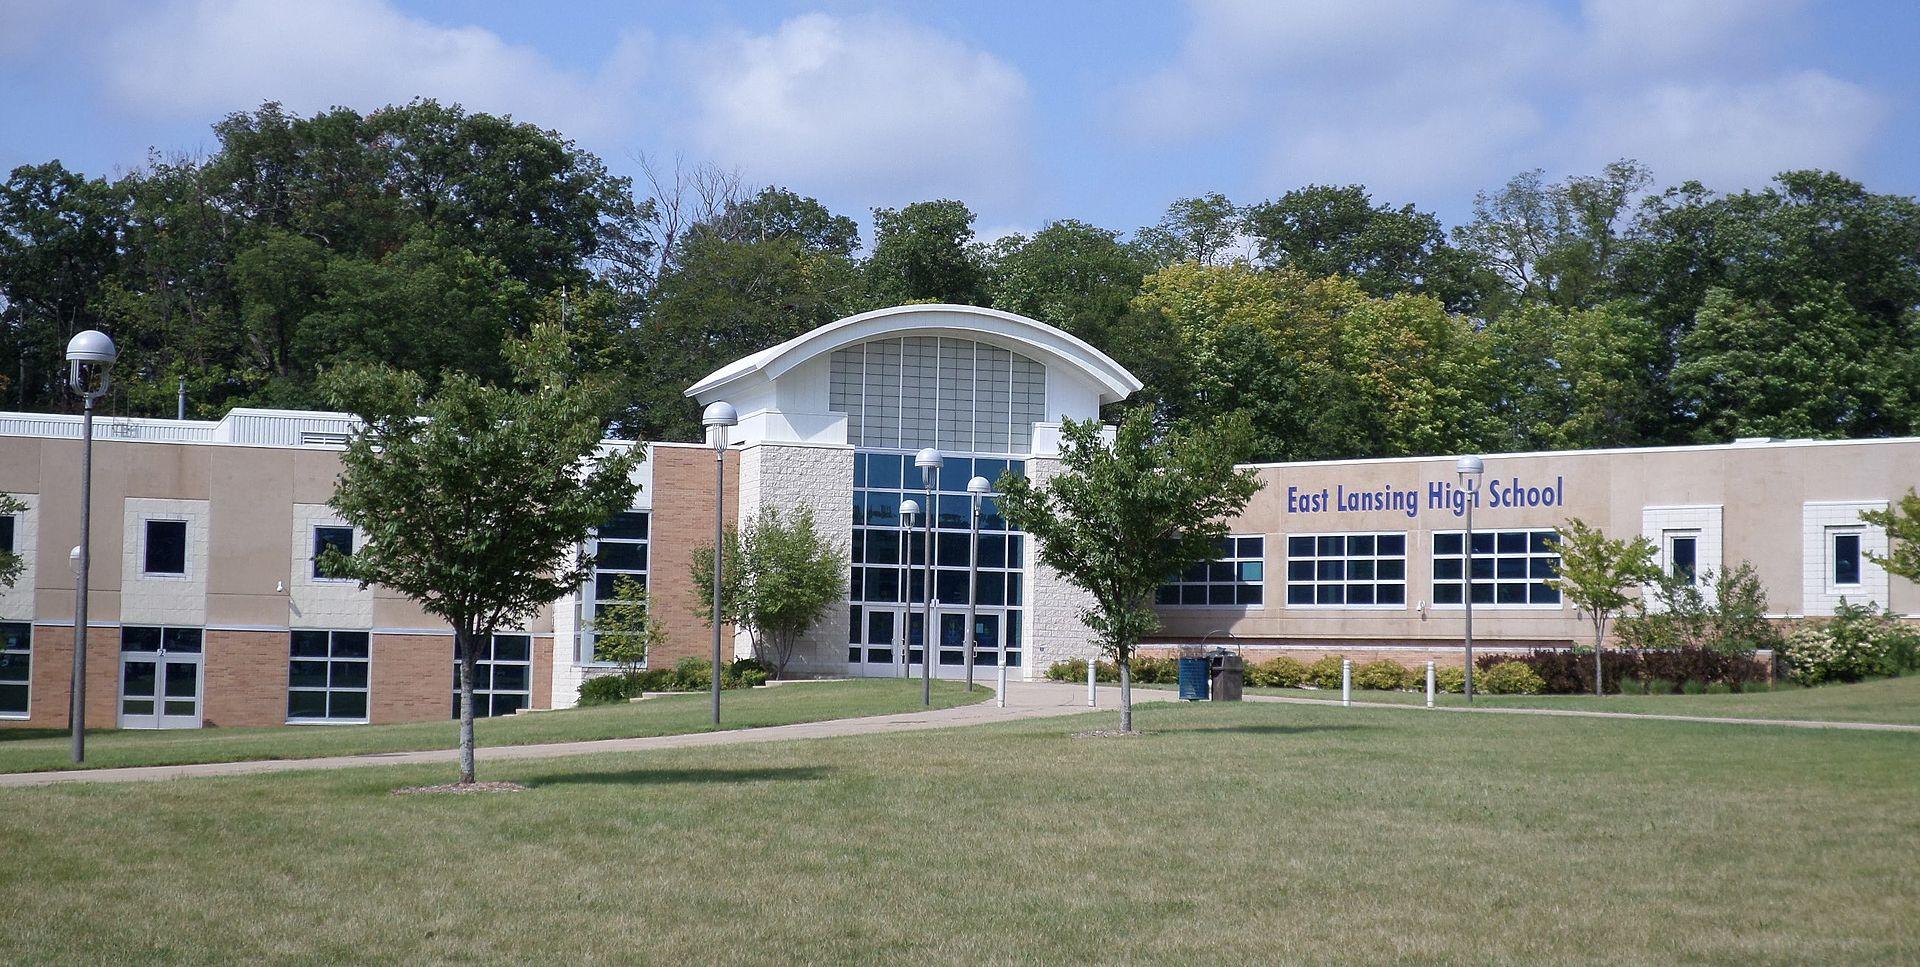 East Lansing High School  Wikipedia